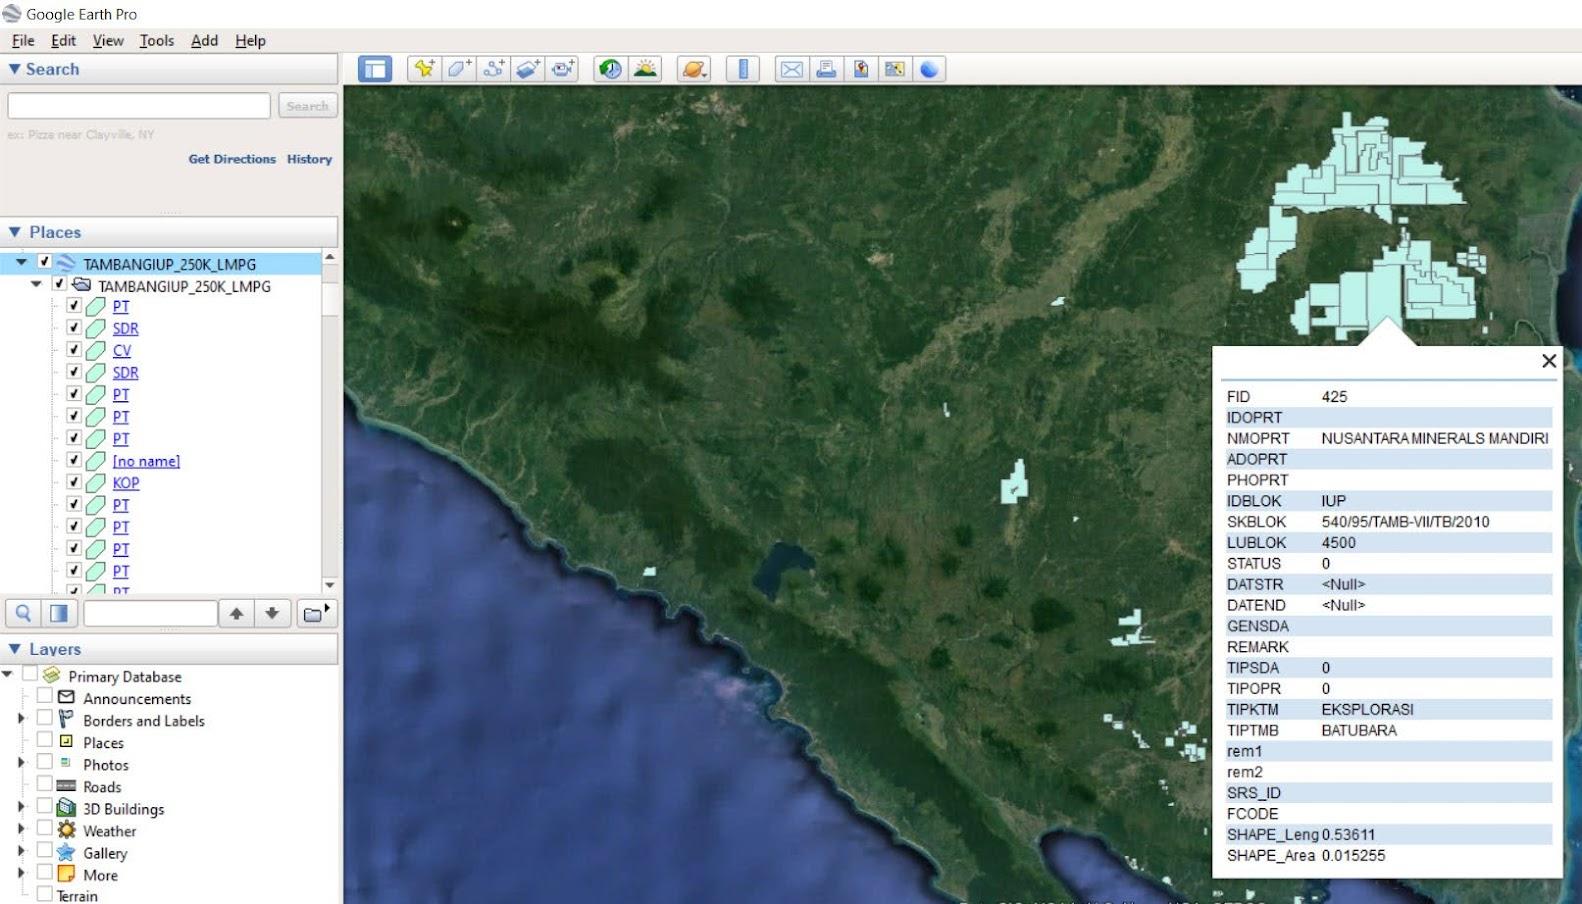 Field KMZ hasil query ArcGIS Rest Service terbaca secara utuh di Google Earth